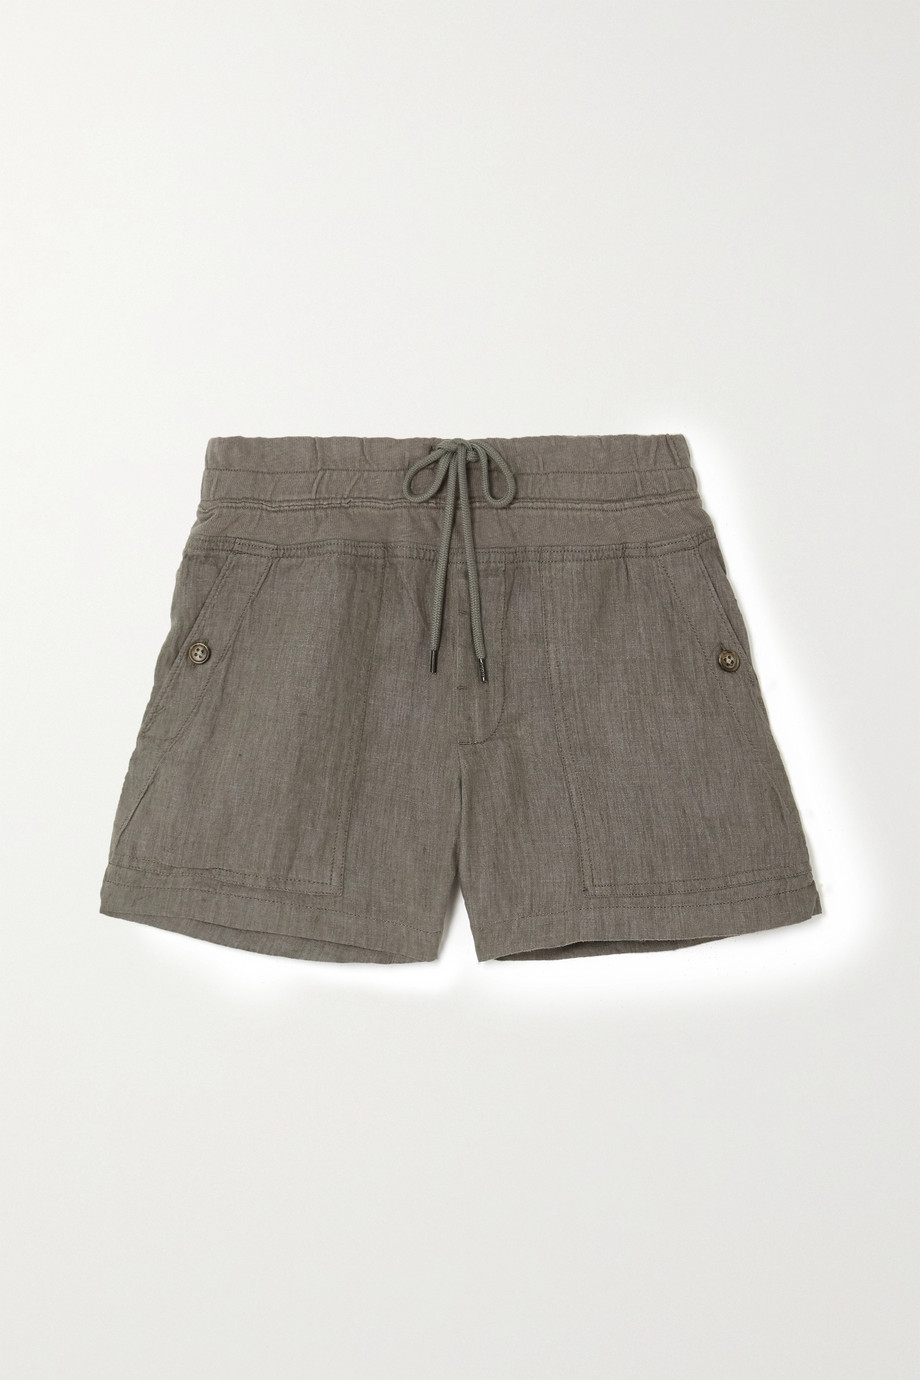 James Perse Linen shorts